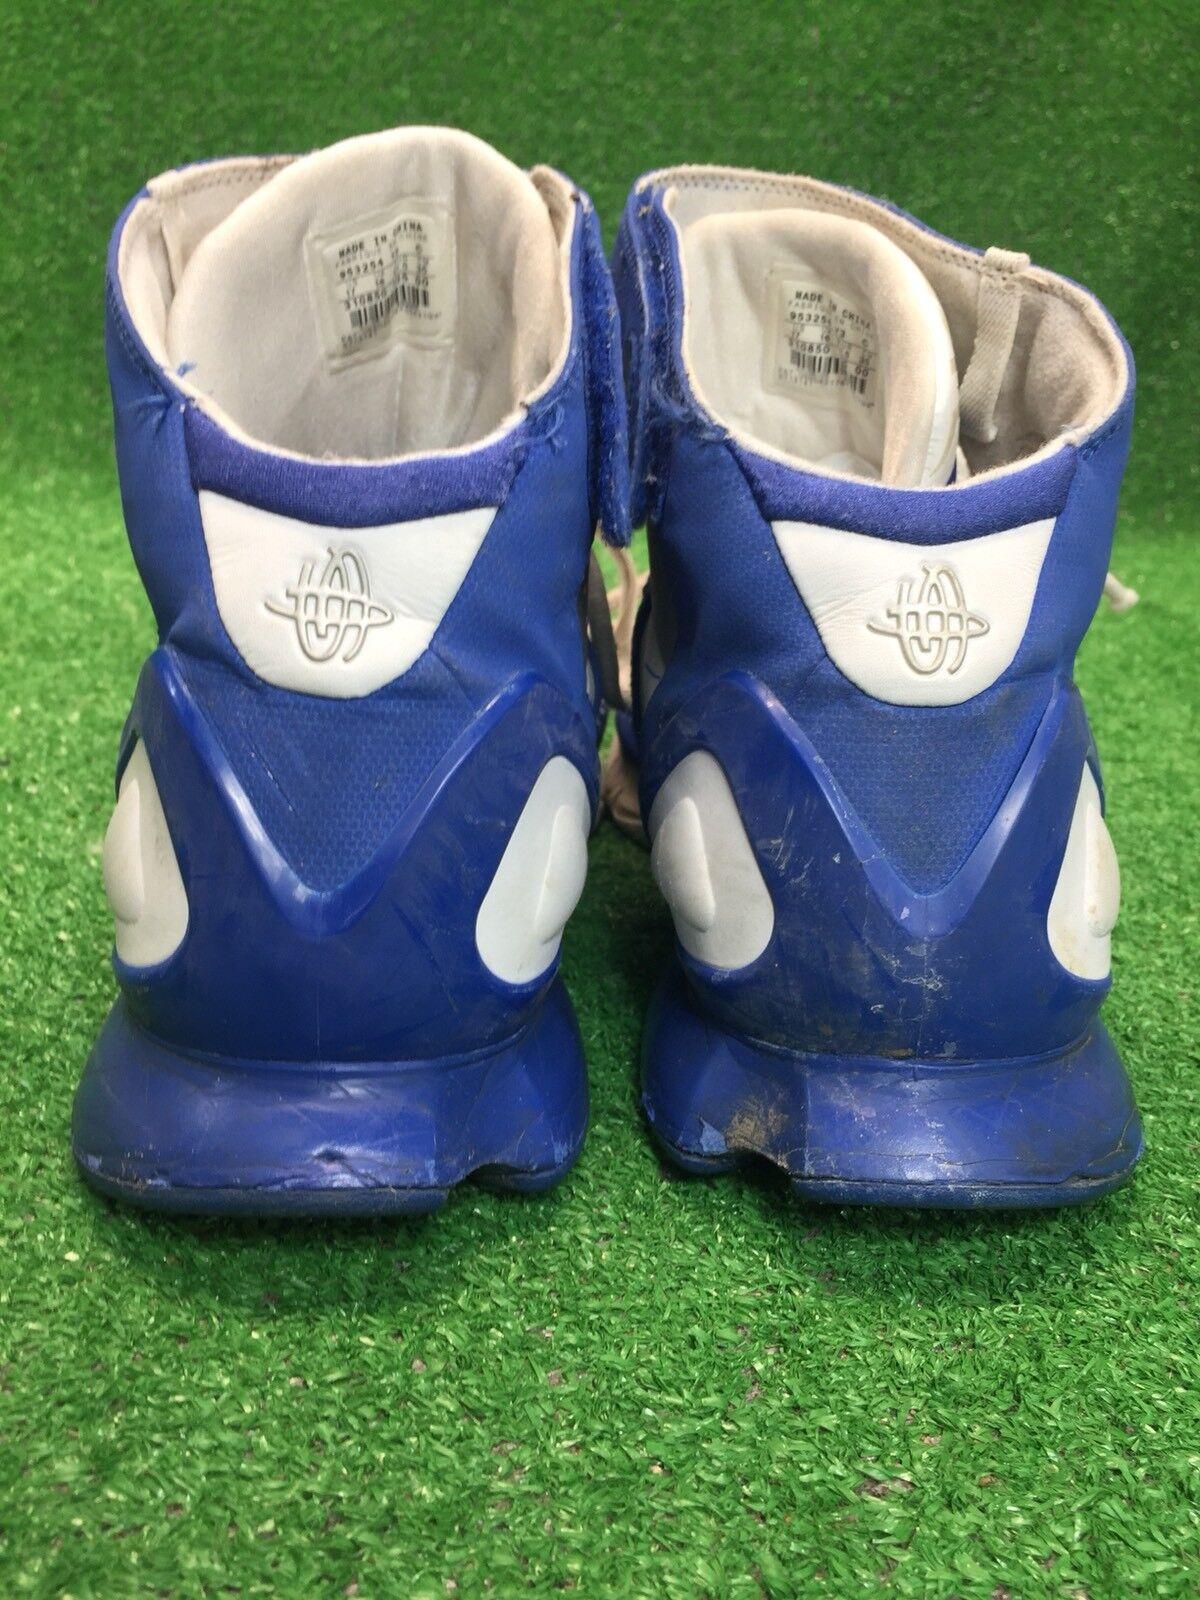 Raro nike air huarache 2k5 db db db kobe dimensioni 17 bianco e blu scarpe da basket dd5021